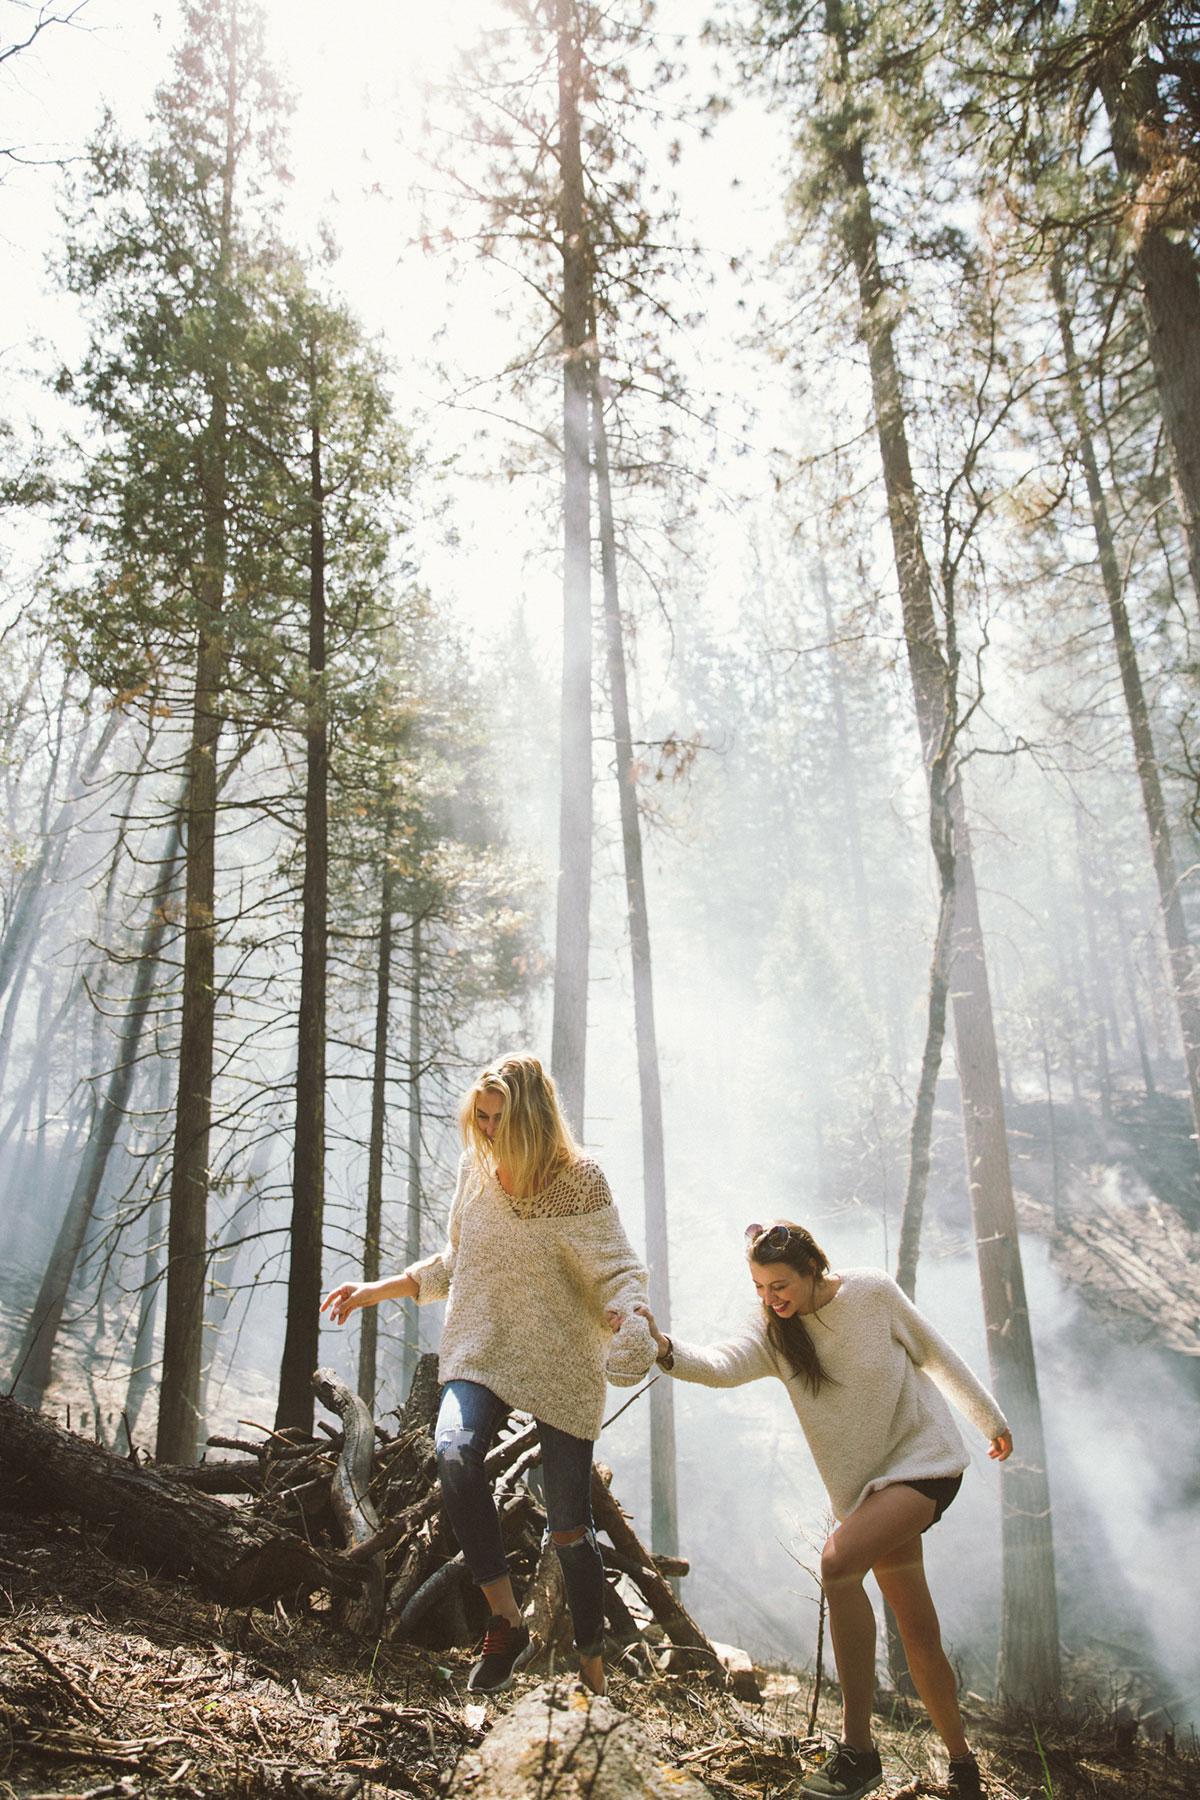 LiveFast_Yosemite_LauraAustin_0379